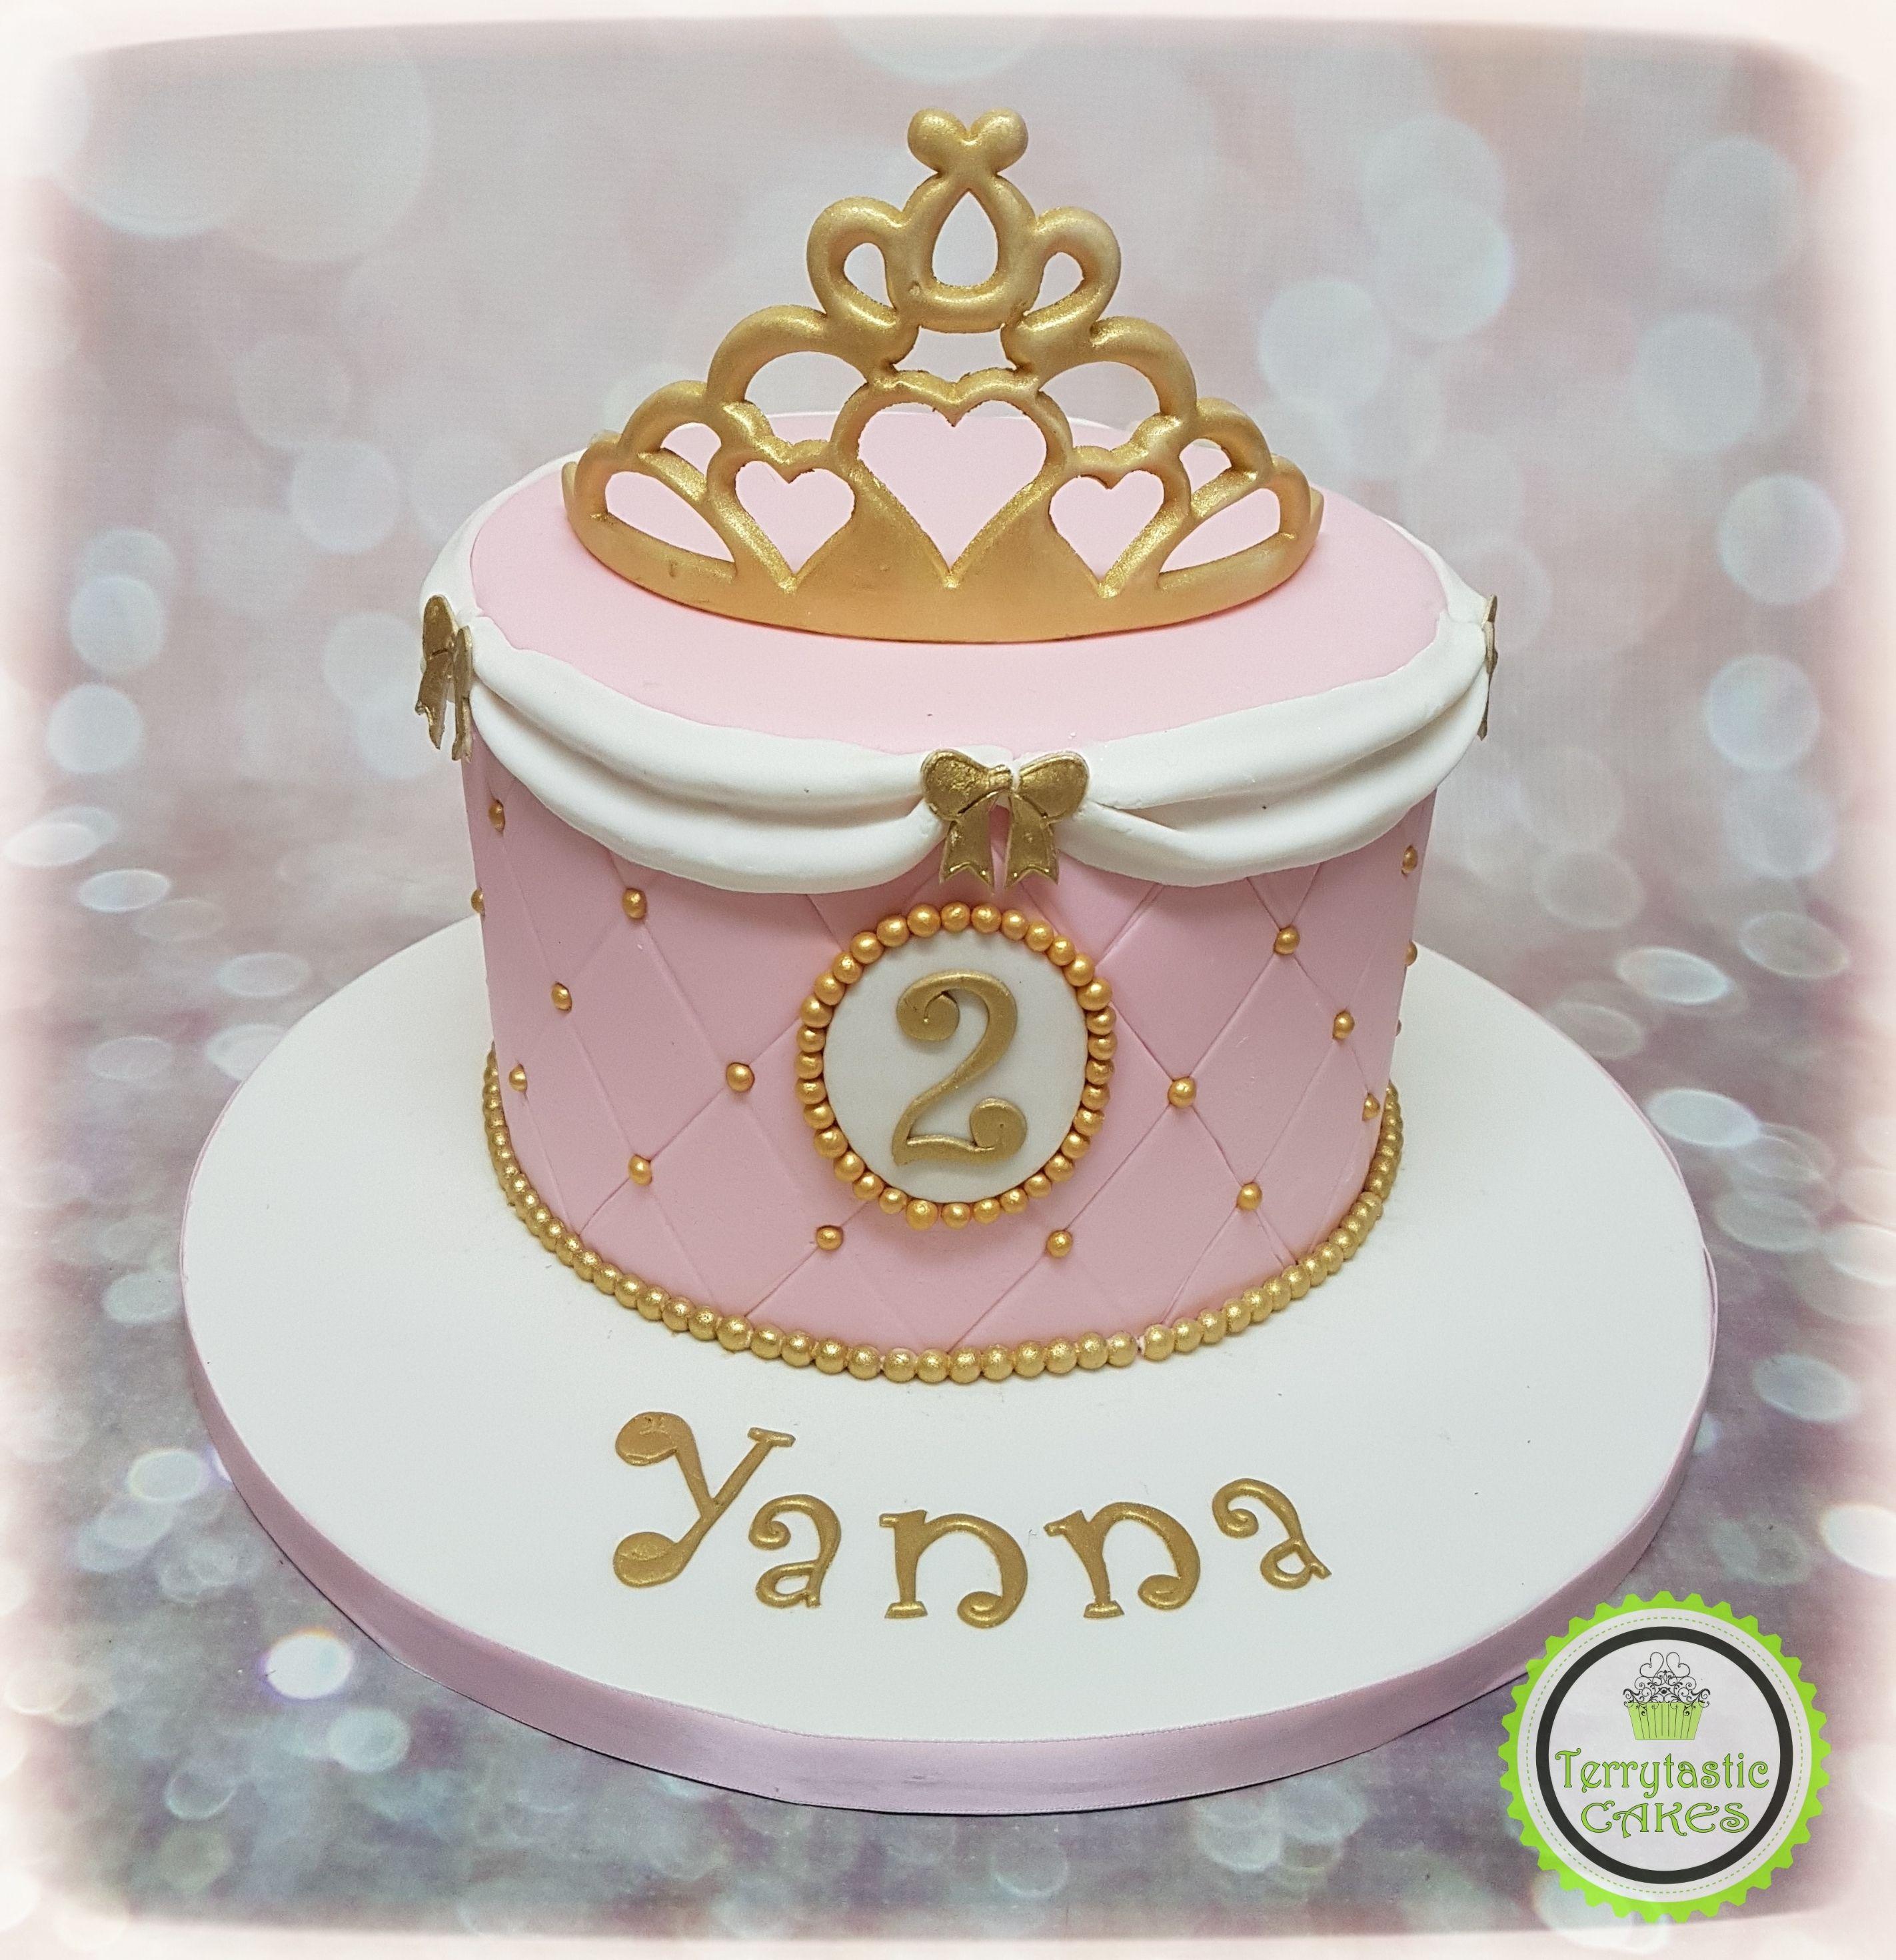 Super 27 Amazing Image Of Crown Birthday Cake Crown Birthday Cake Funny Birthday Cards Online Elaedamsfinfo